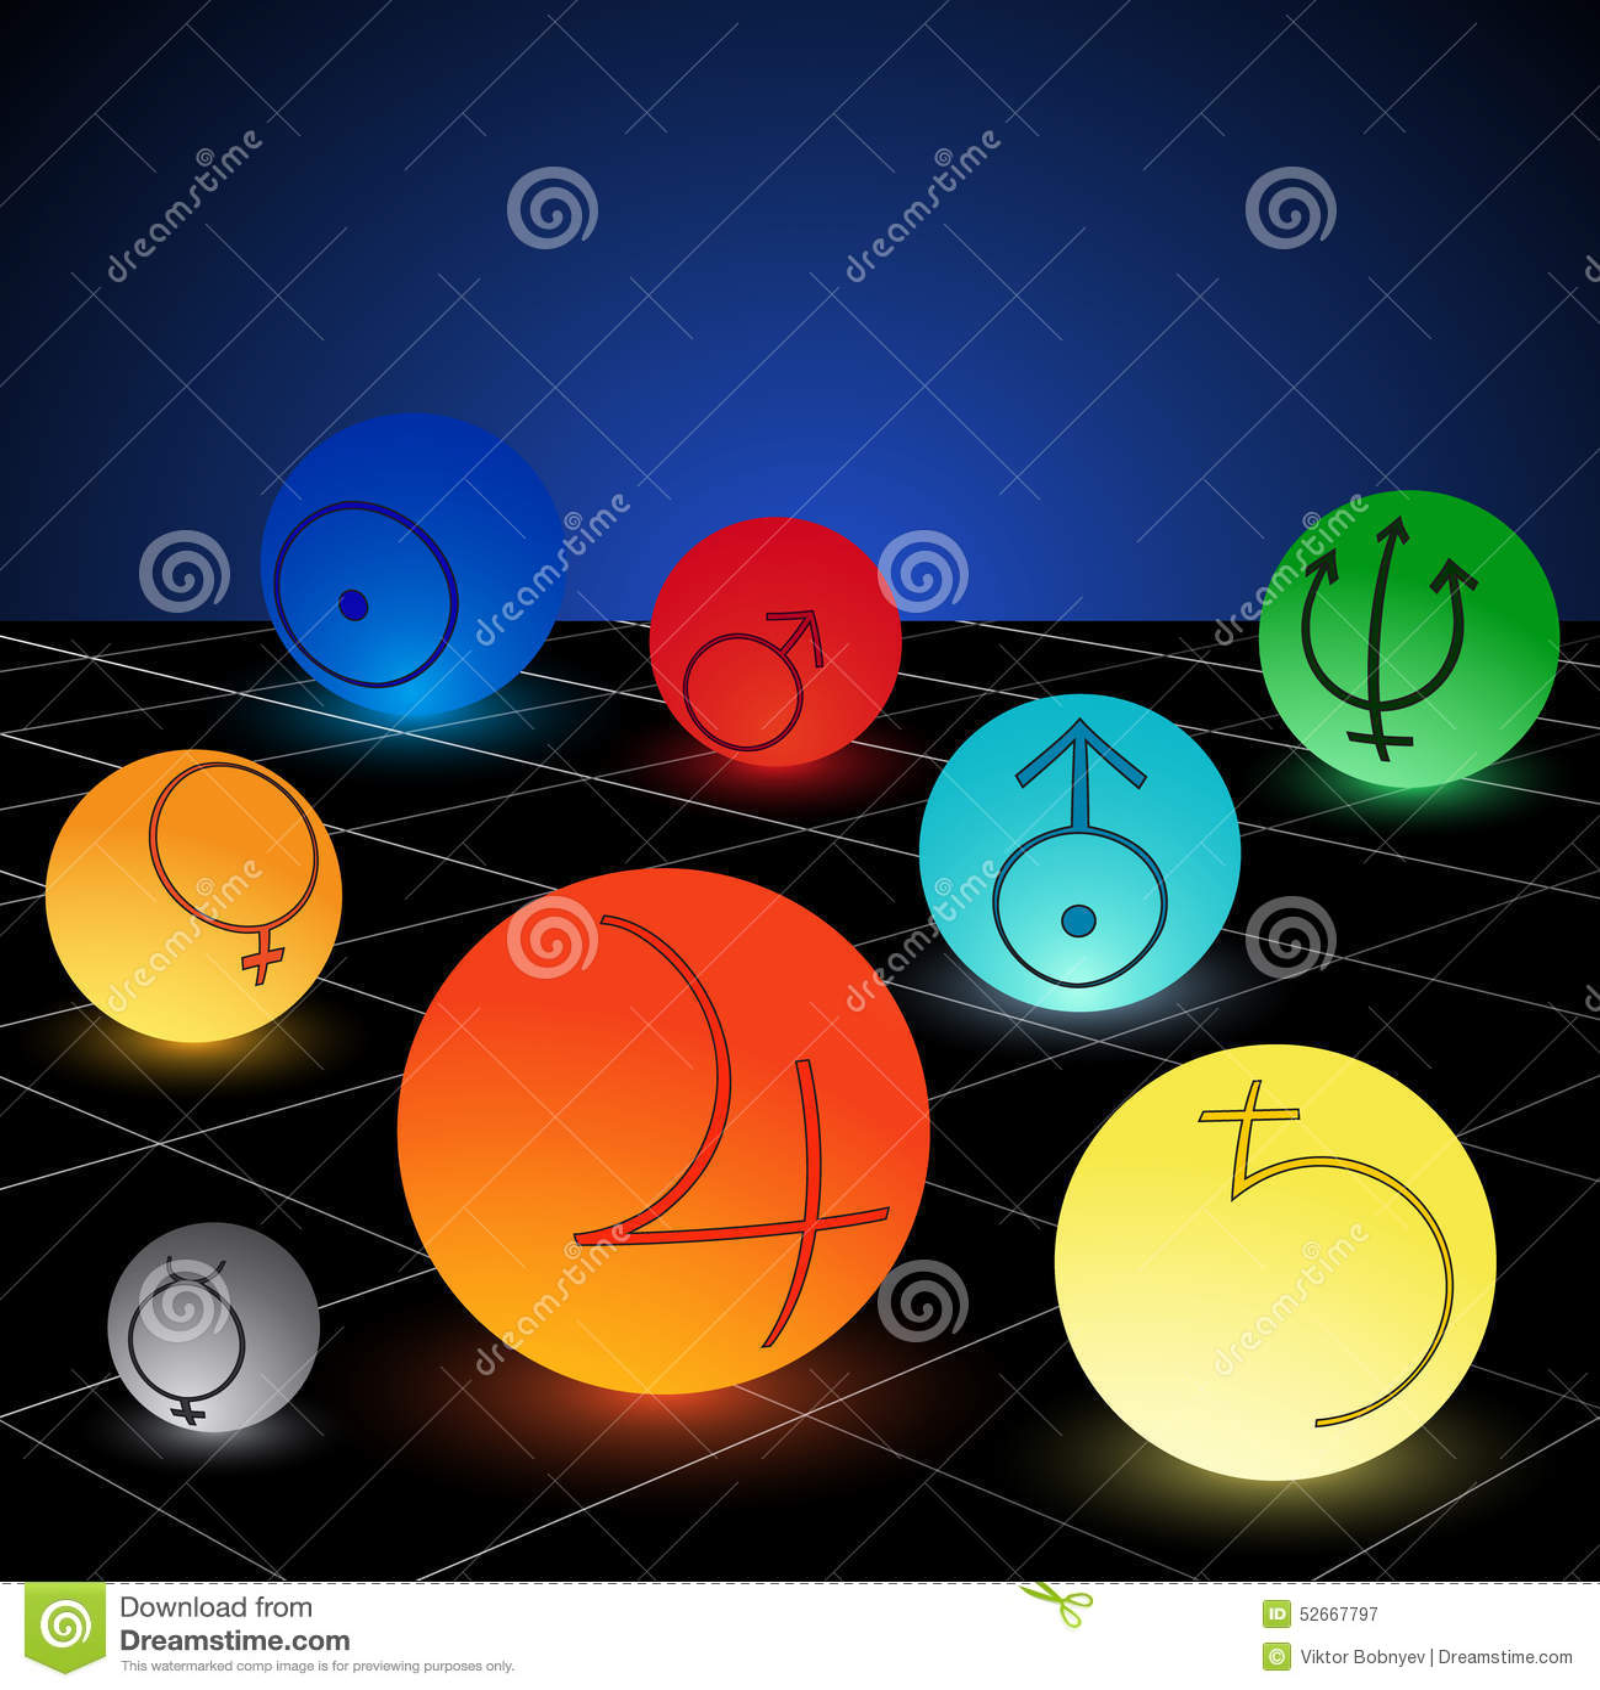 solar system symbols - photo #35